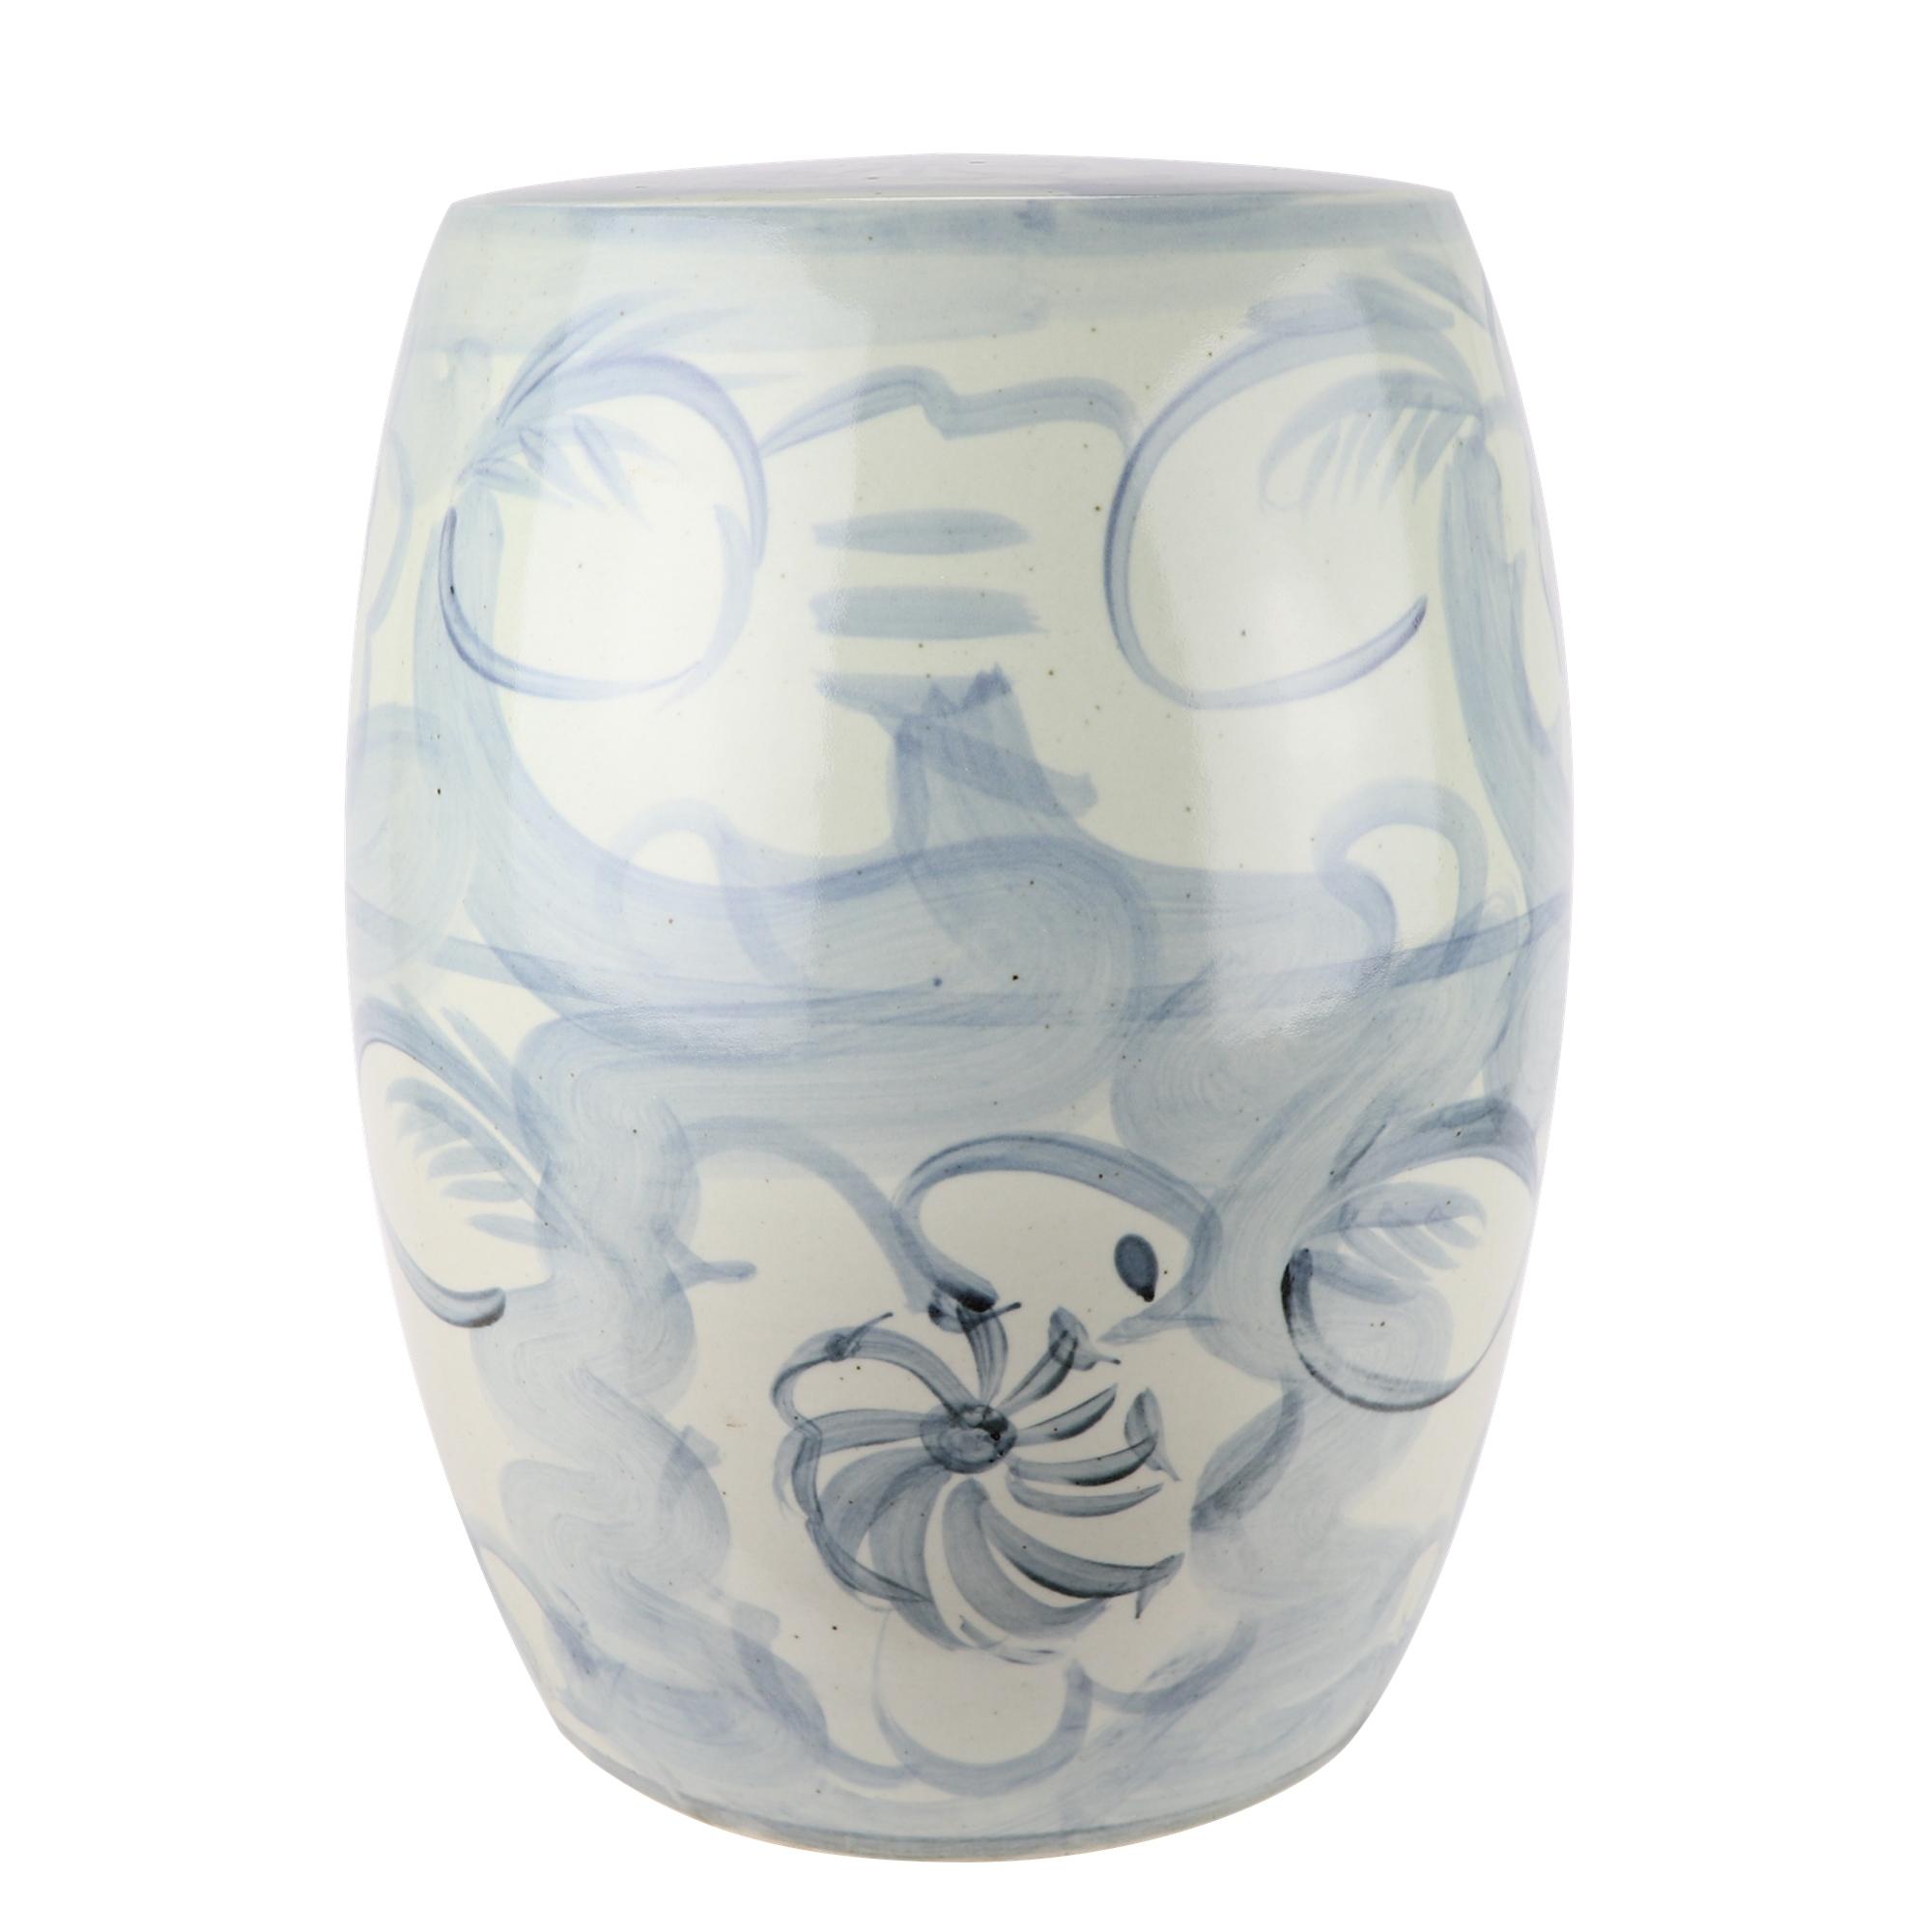 RZNA04-B 陶瓷摆件创意手颜色釉鼓凳